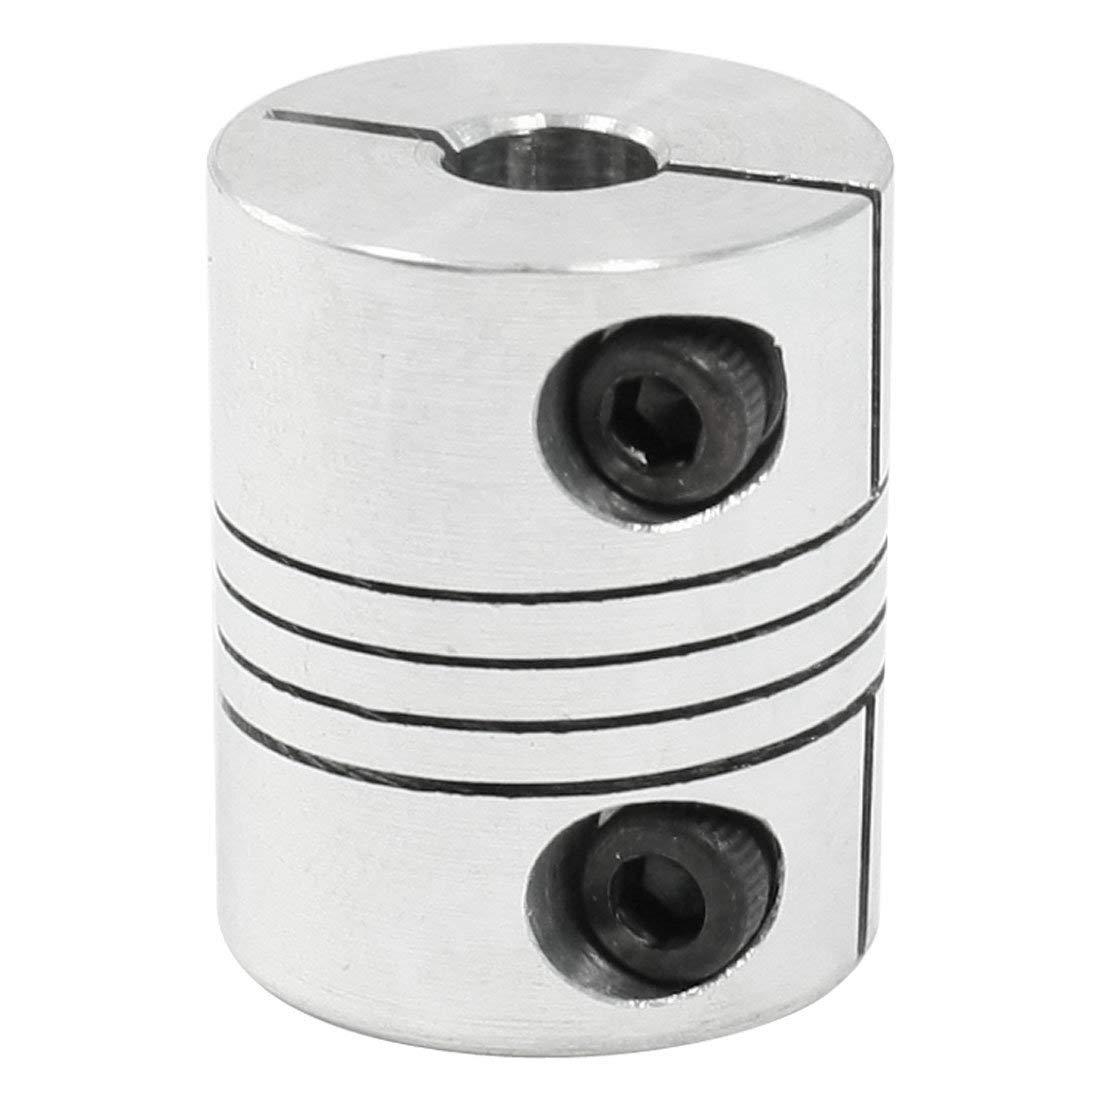 SODIAL(R) 6.35mm to 6.35mm CNC Stepper Motor Shaft Coupling Coupler for Encoder